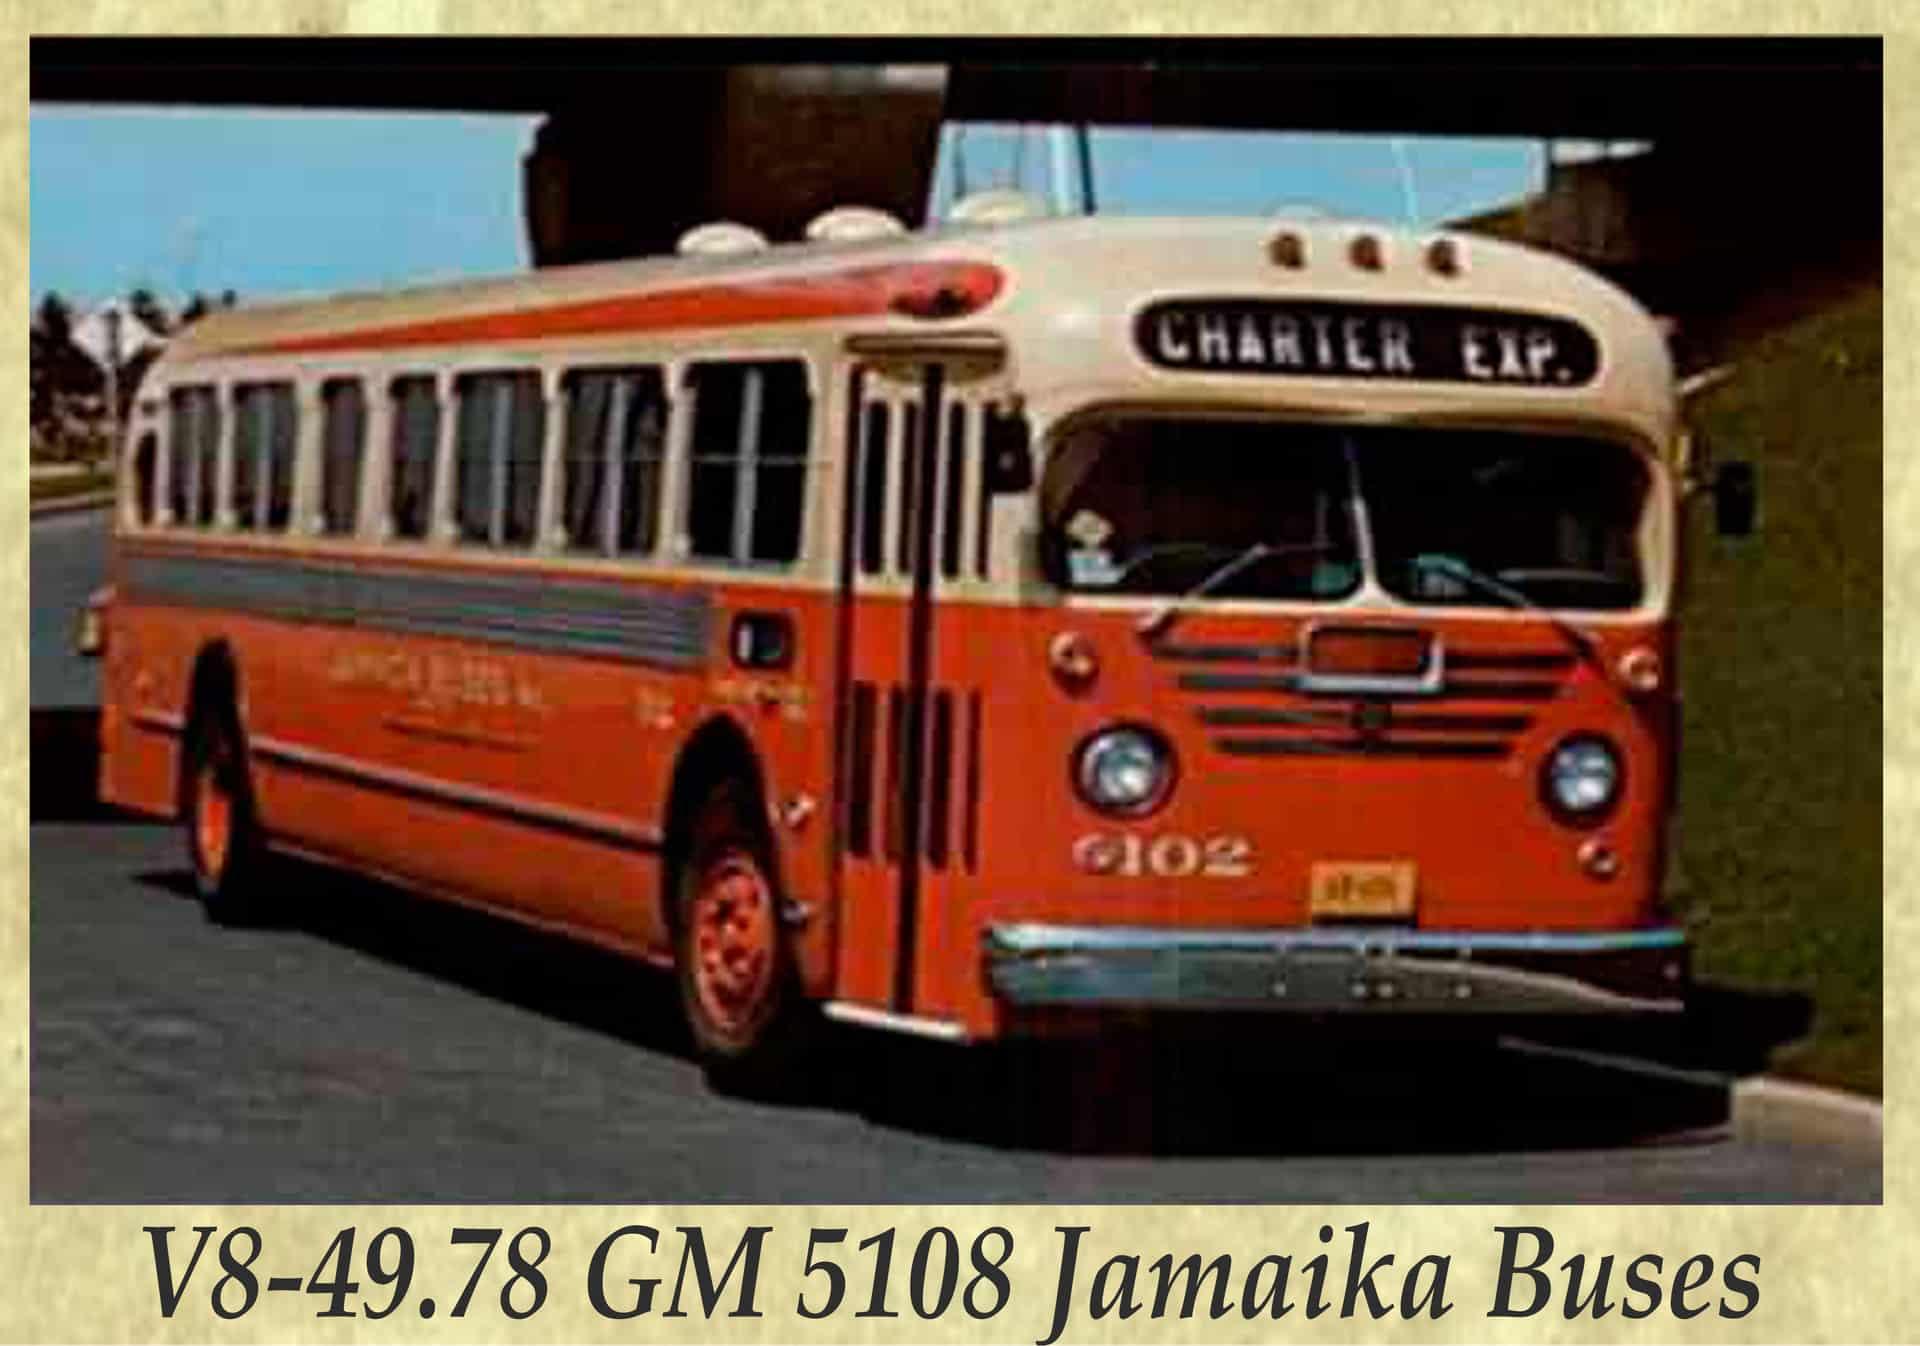 V8-49.78 GM 5108 Jamaika Buses